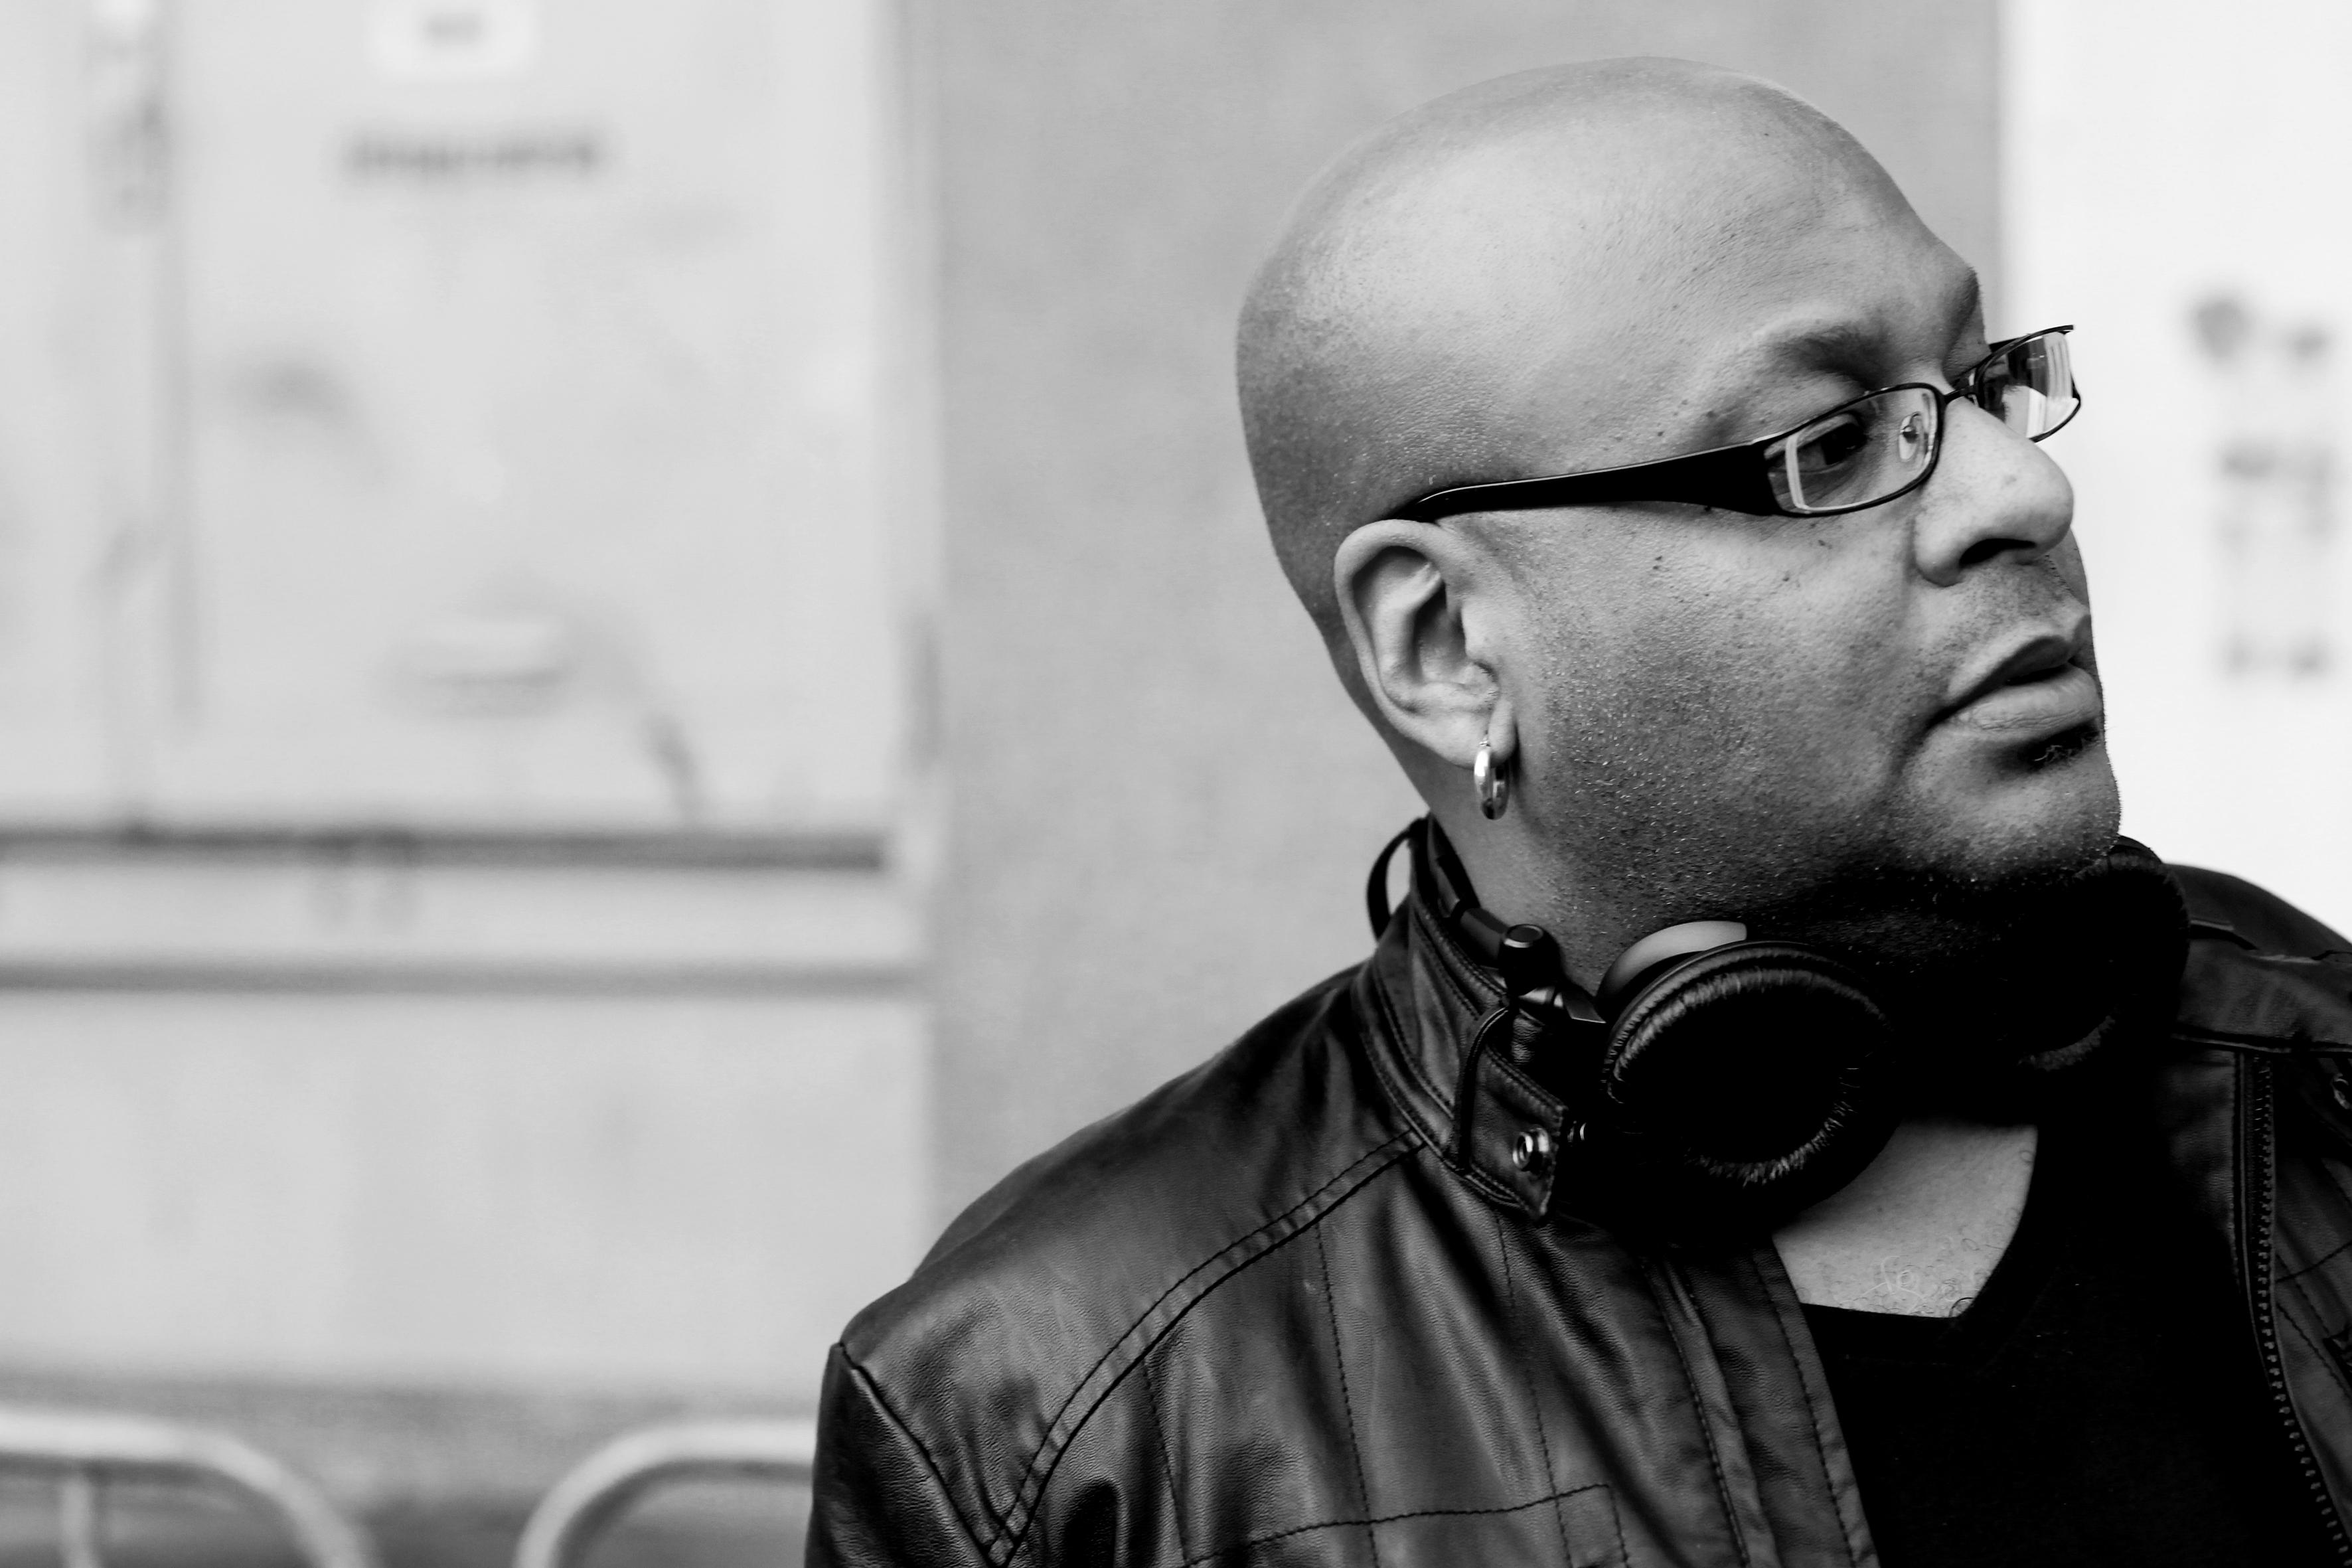 Detroit techno's renaissance man - Alan Oldham.